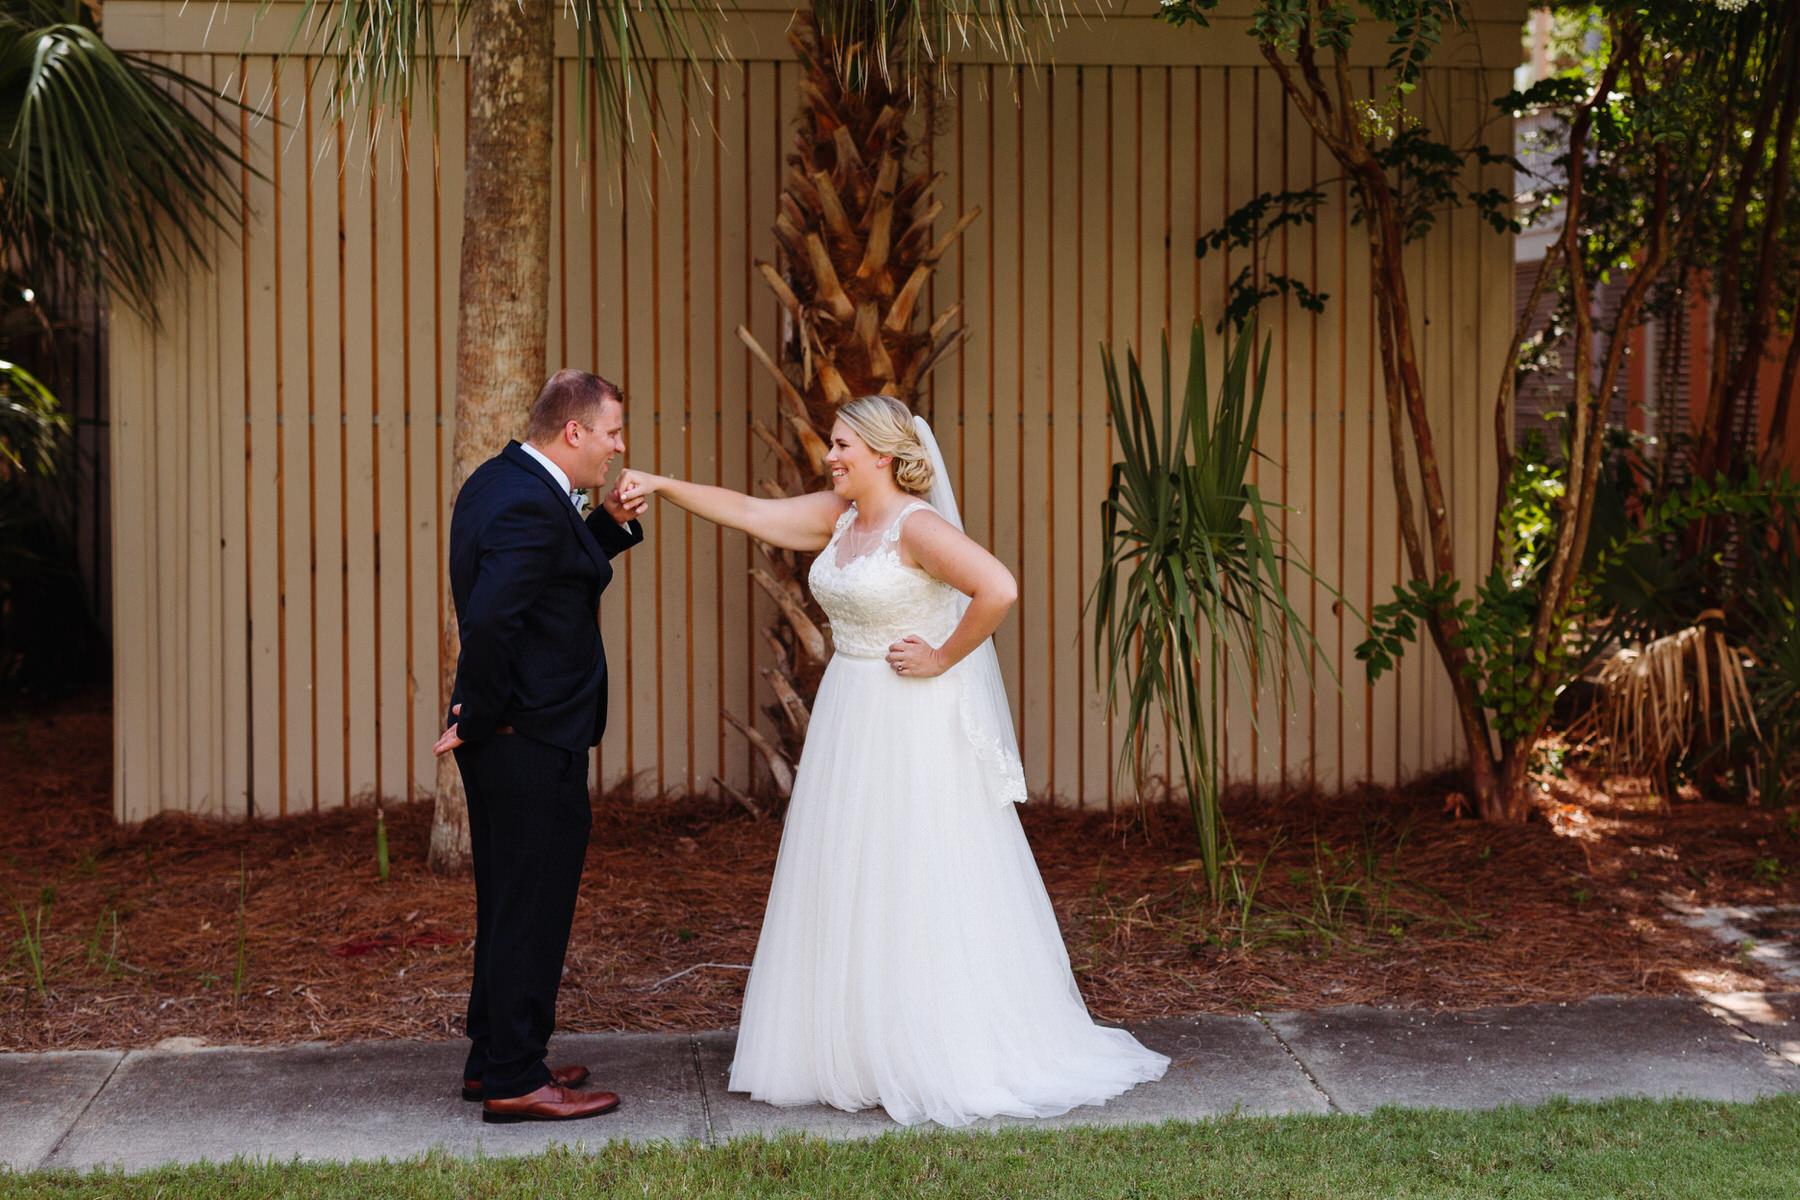 wild-dunes-charleston-isle-of-palms-IOP-wedding-775.JPG